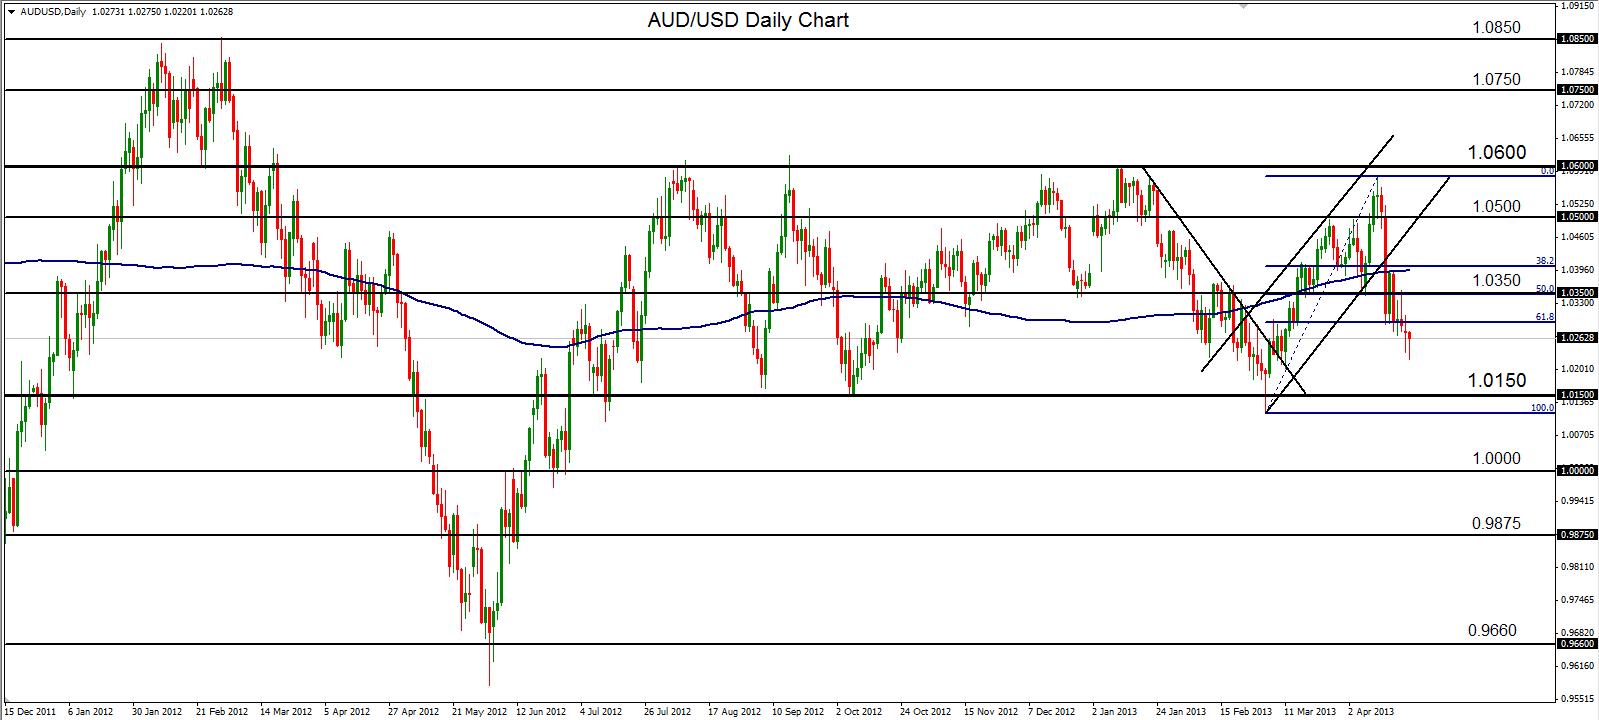 USD JPY remains pressured around 100 on persistent Fed BoJ uncertainty